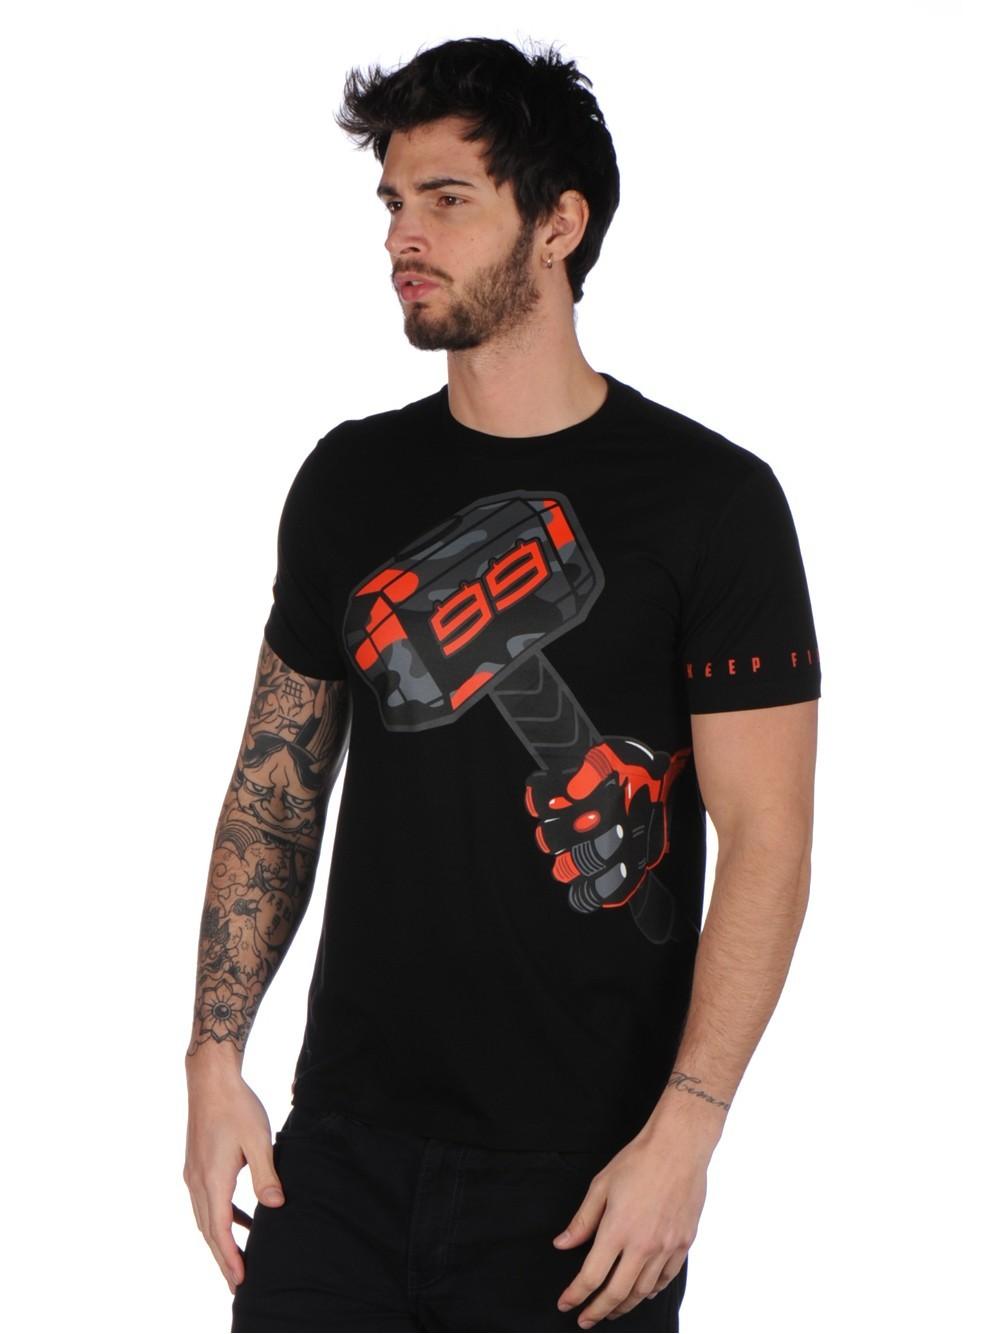 Free Shipping Moto gp  Jorge Lorenzo 99 Moto Hammer Motor Sports Summer Men's T-shirt Black